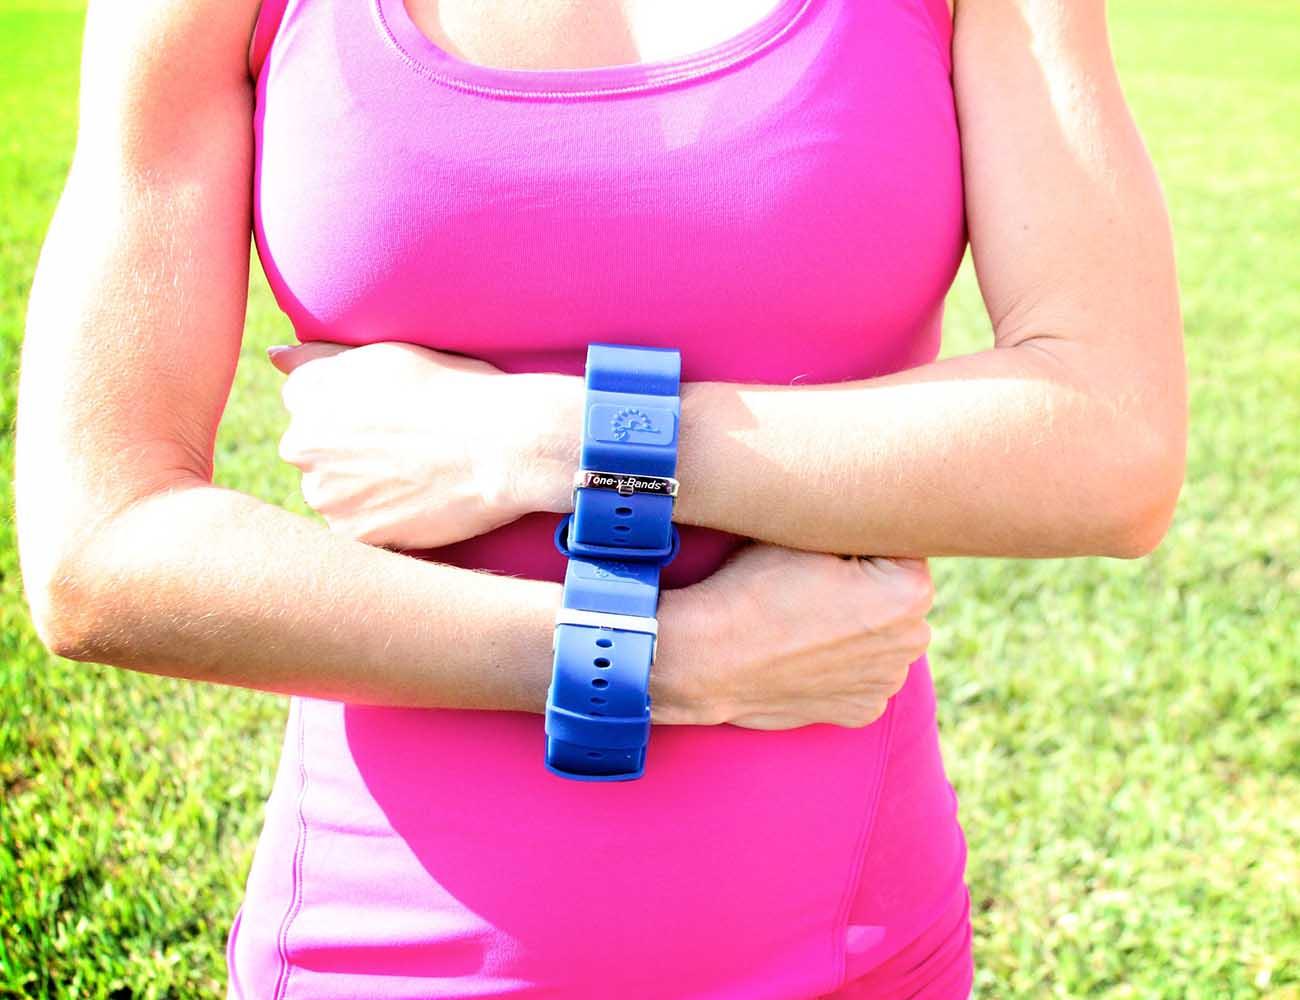 Tone-y-Bands Cardio Weights